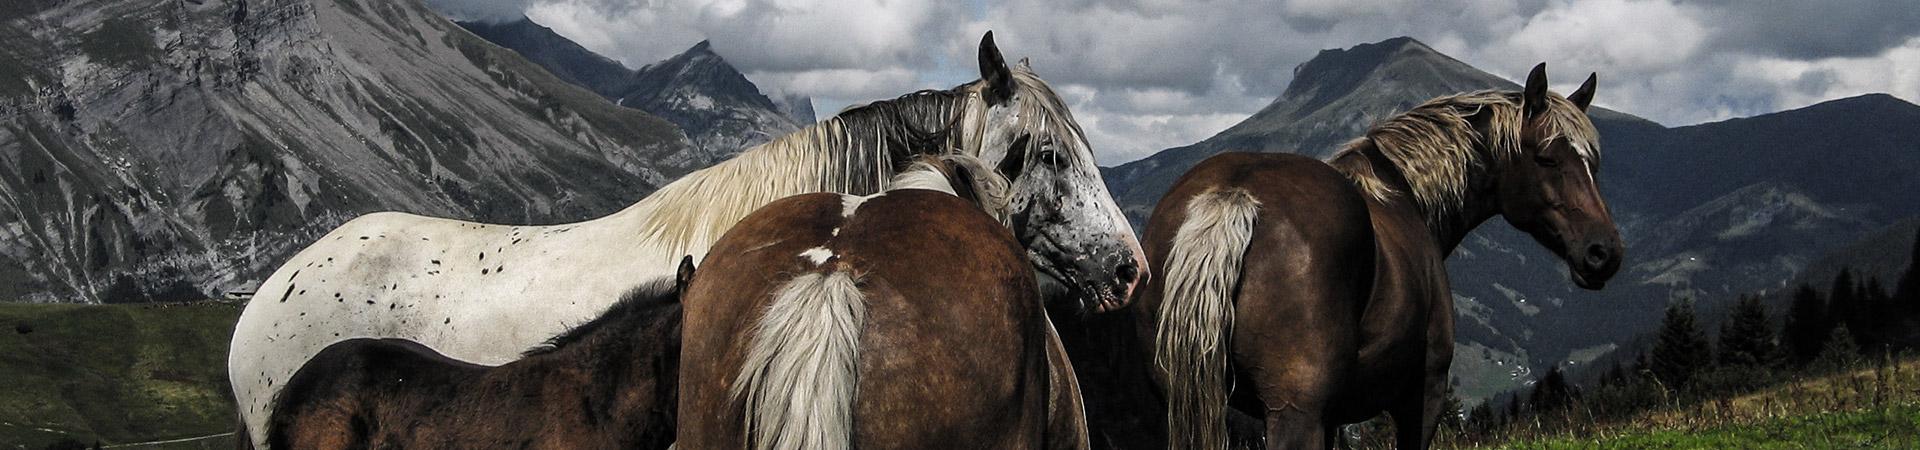 bandeau_equitation.jpg